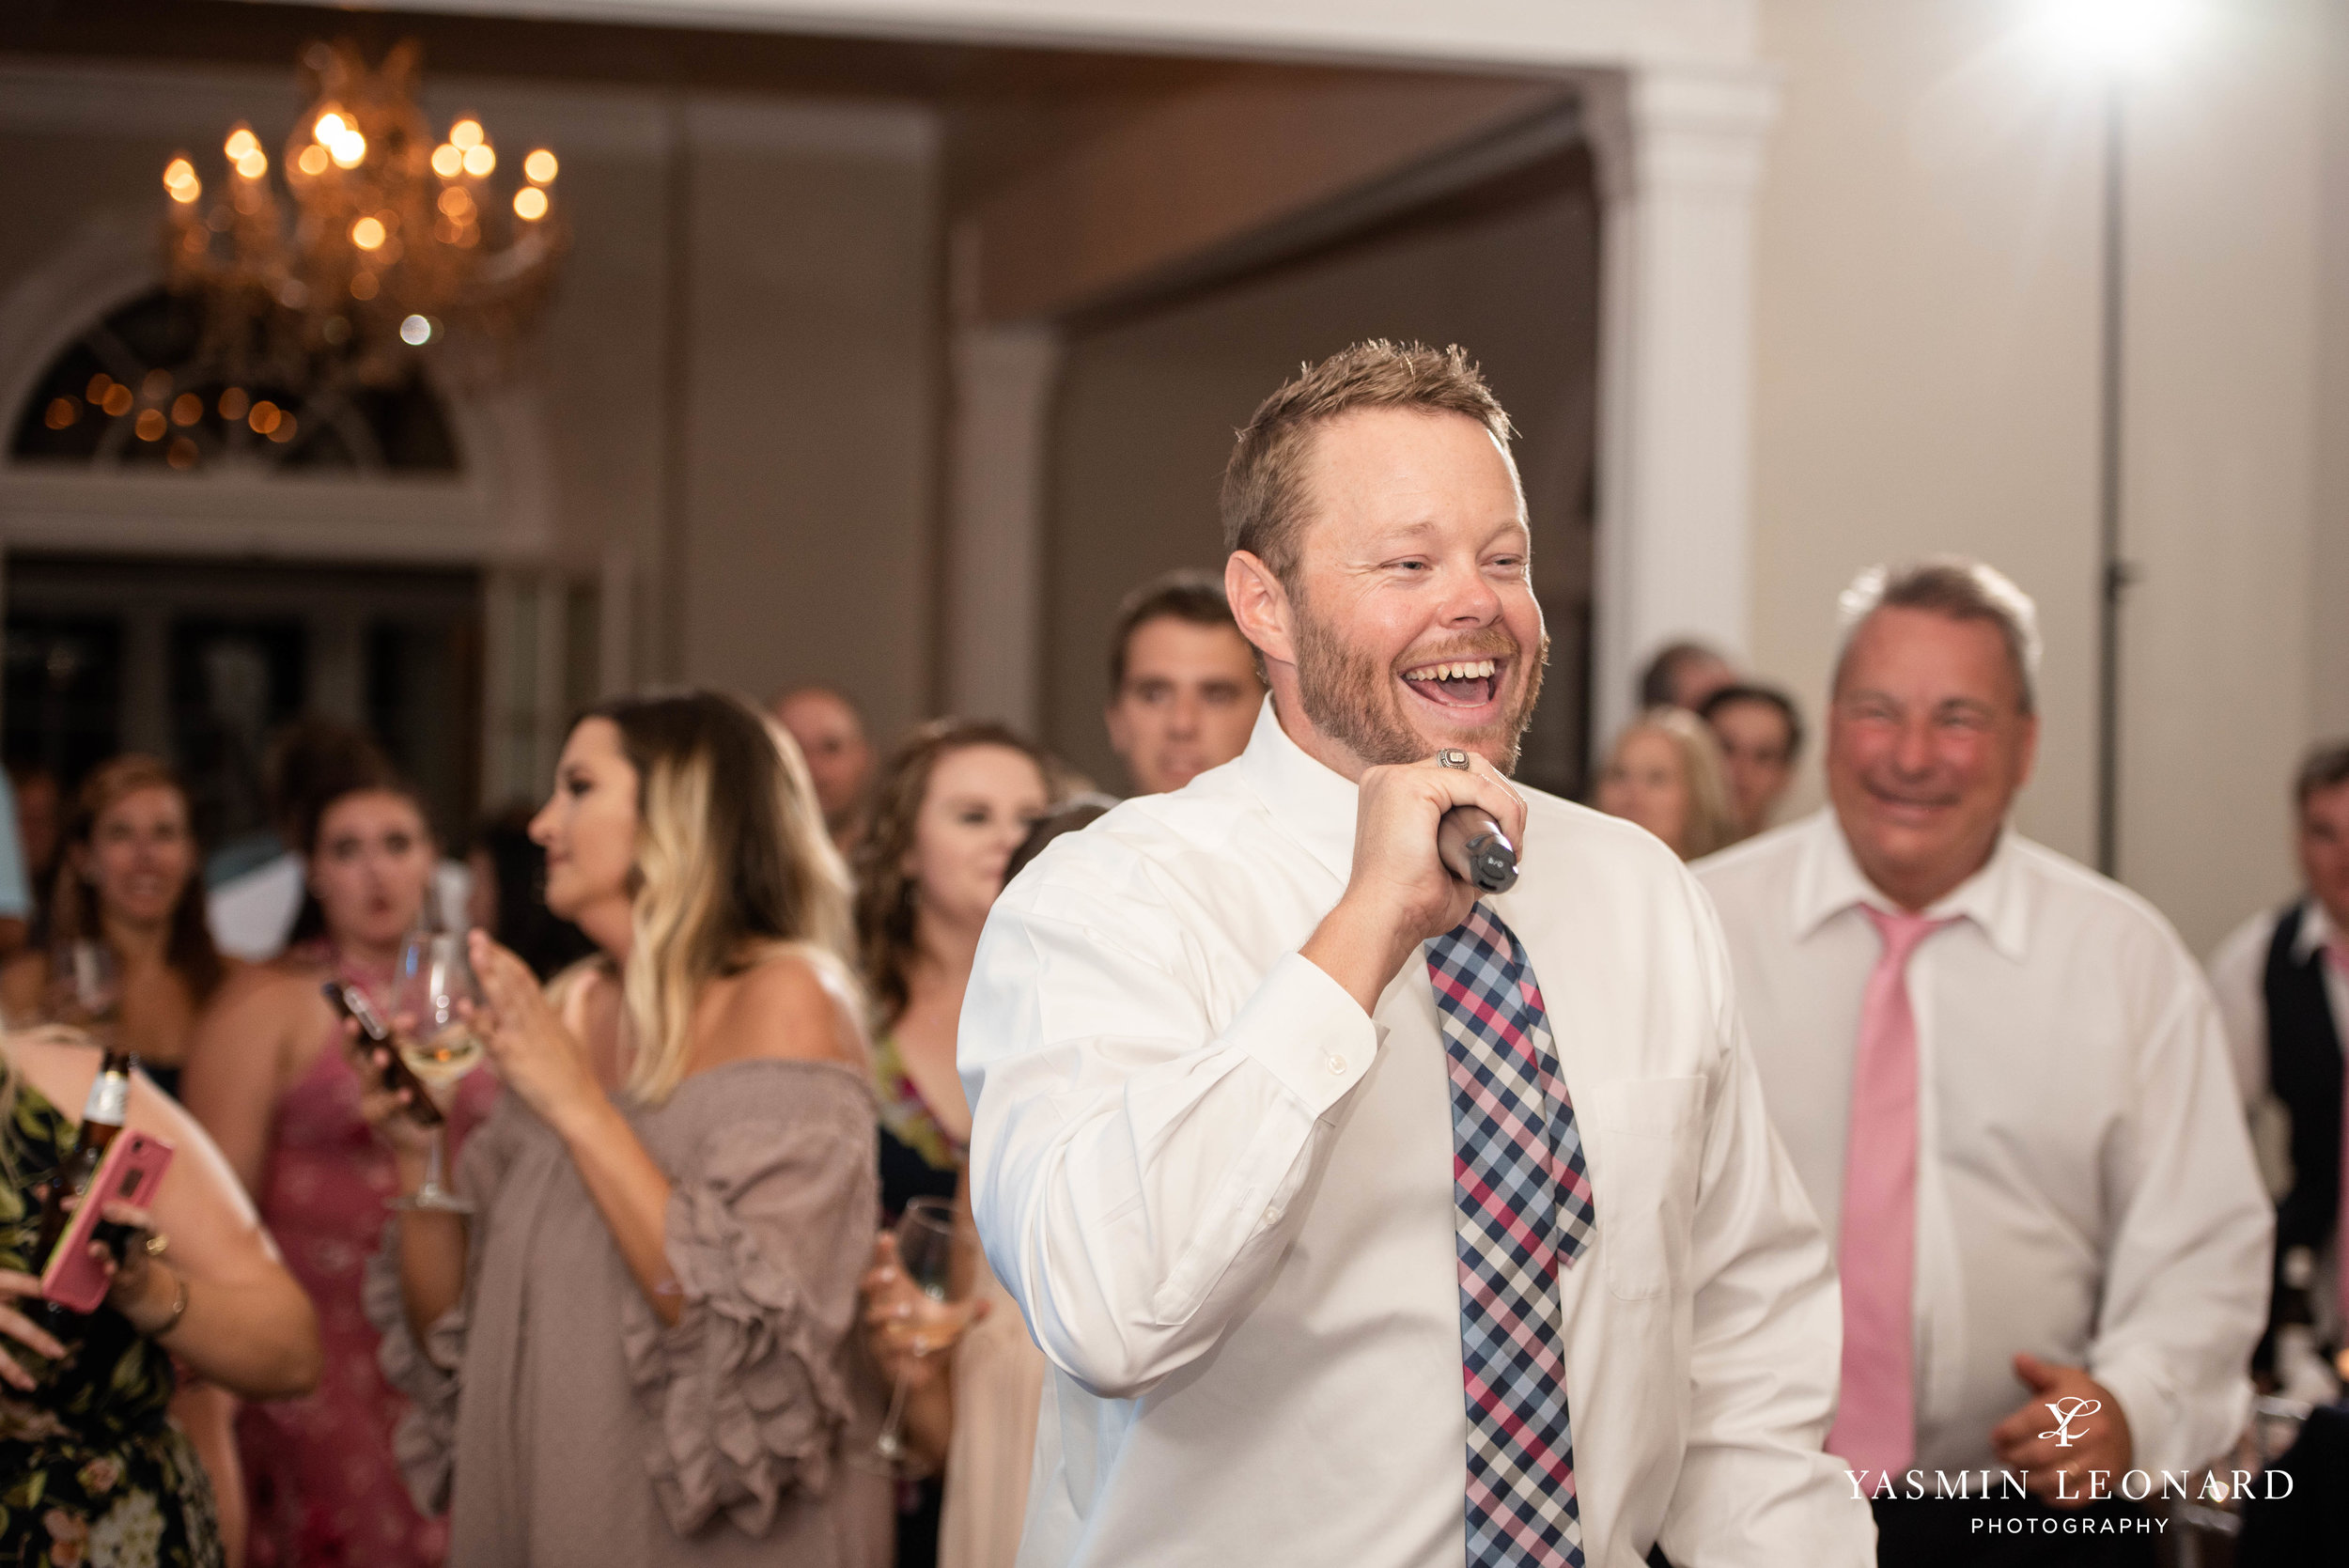 Separk Mansion - NC Weddings - Gastonia Wedding - NC Wedding Venues - Pink and Blue Wedding Ideas - Pink Bridesmaid Dresses - Yasmin Leonard Photography-66.jpg